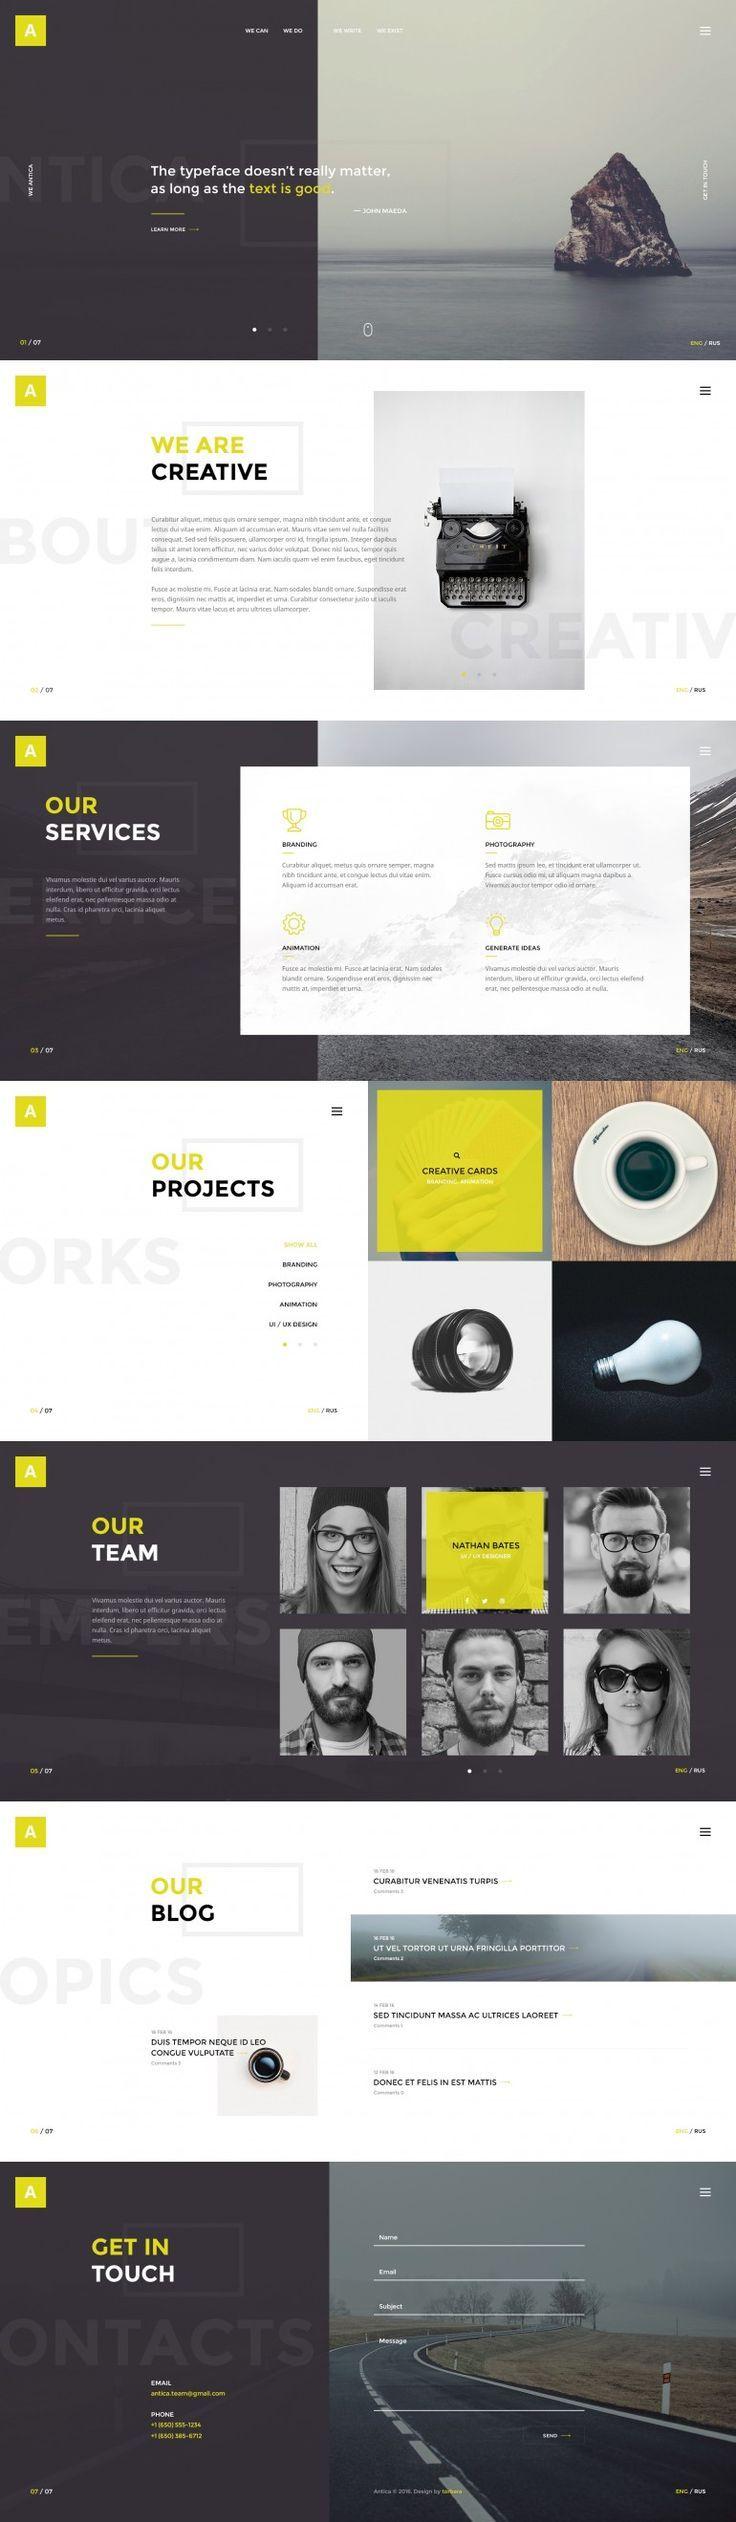 Web Design Inspiration. Web Design. Opus Online.